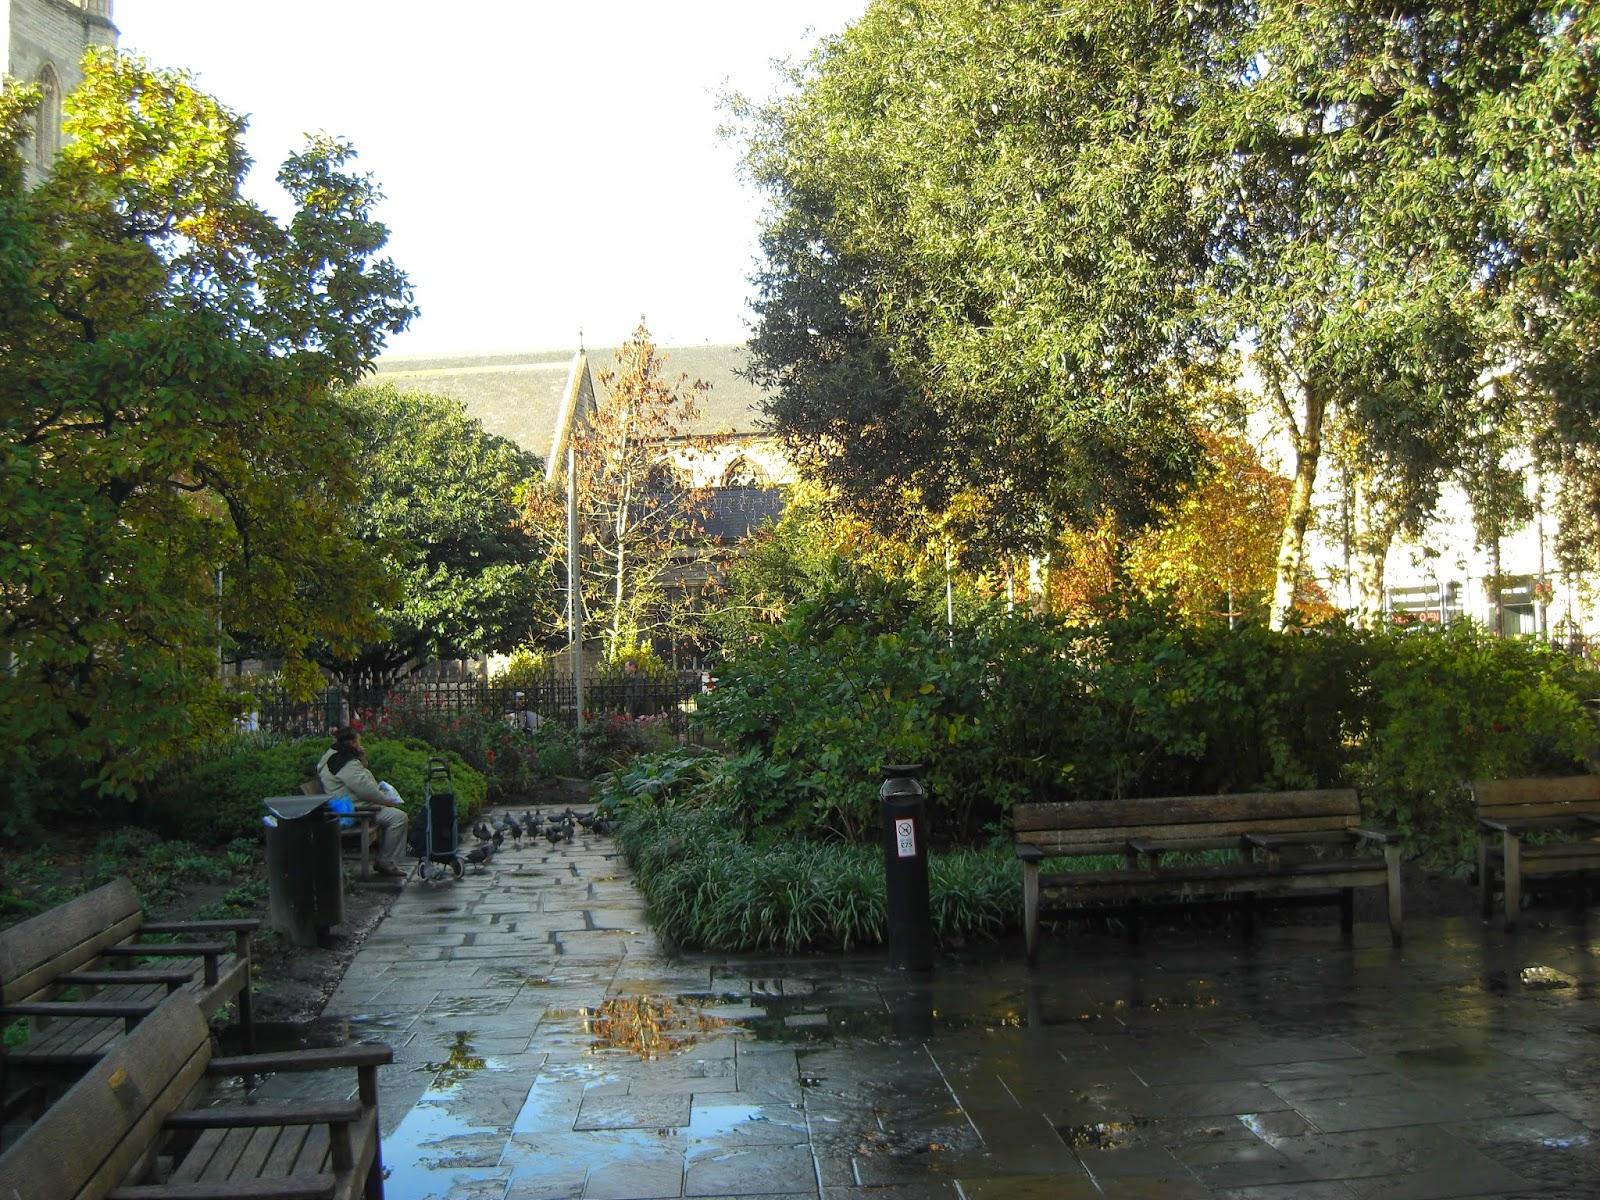 Ogródek przy kościele St. John the Baptist